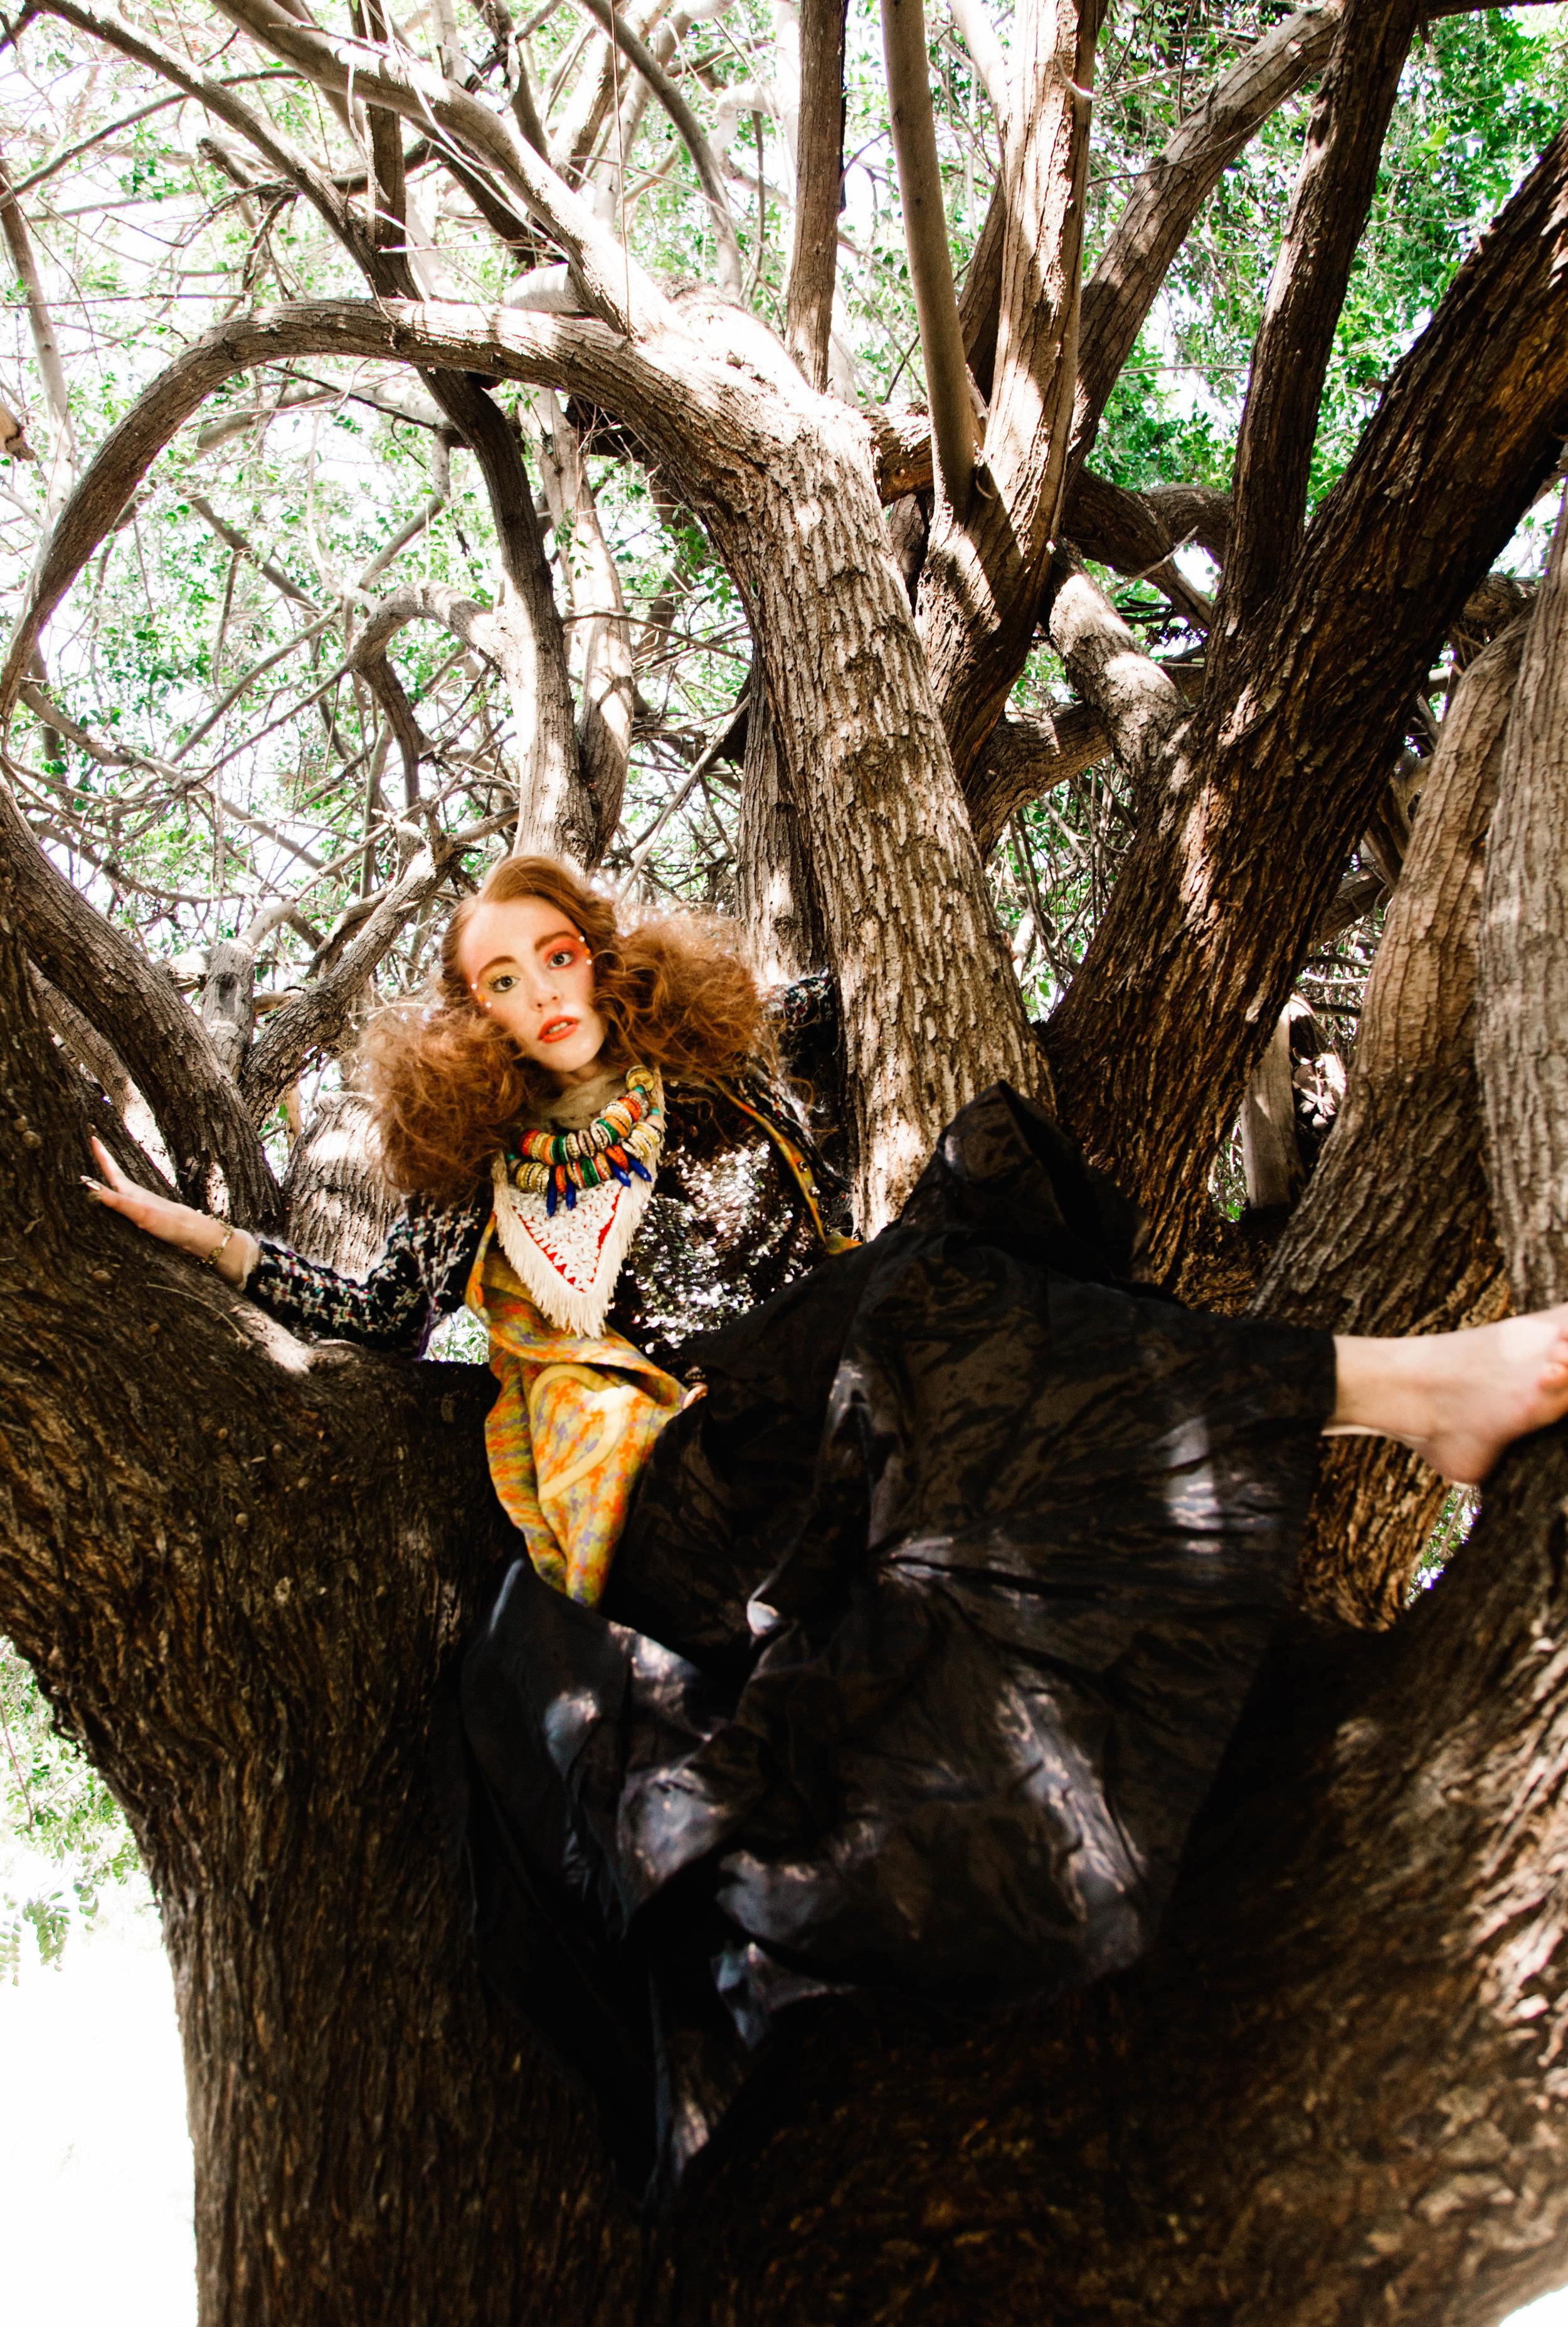 Alice & Wonderland_17-541-23.jpg